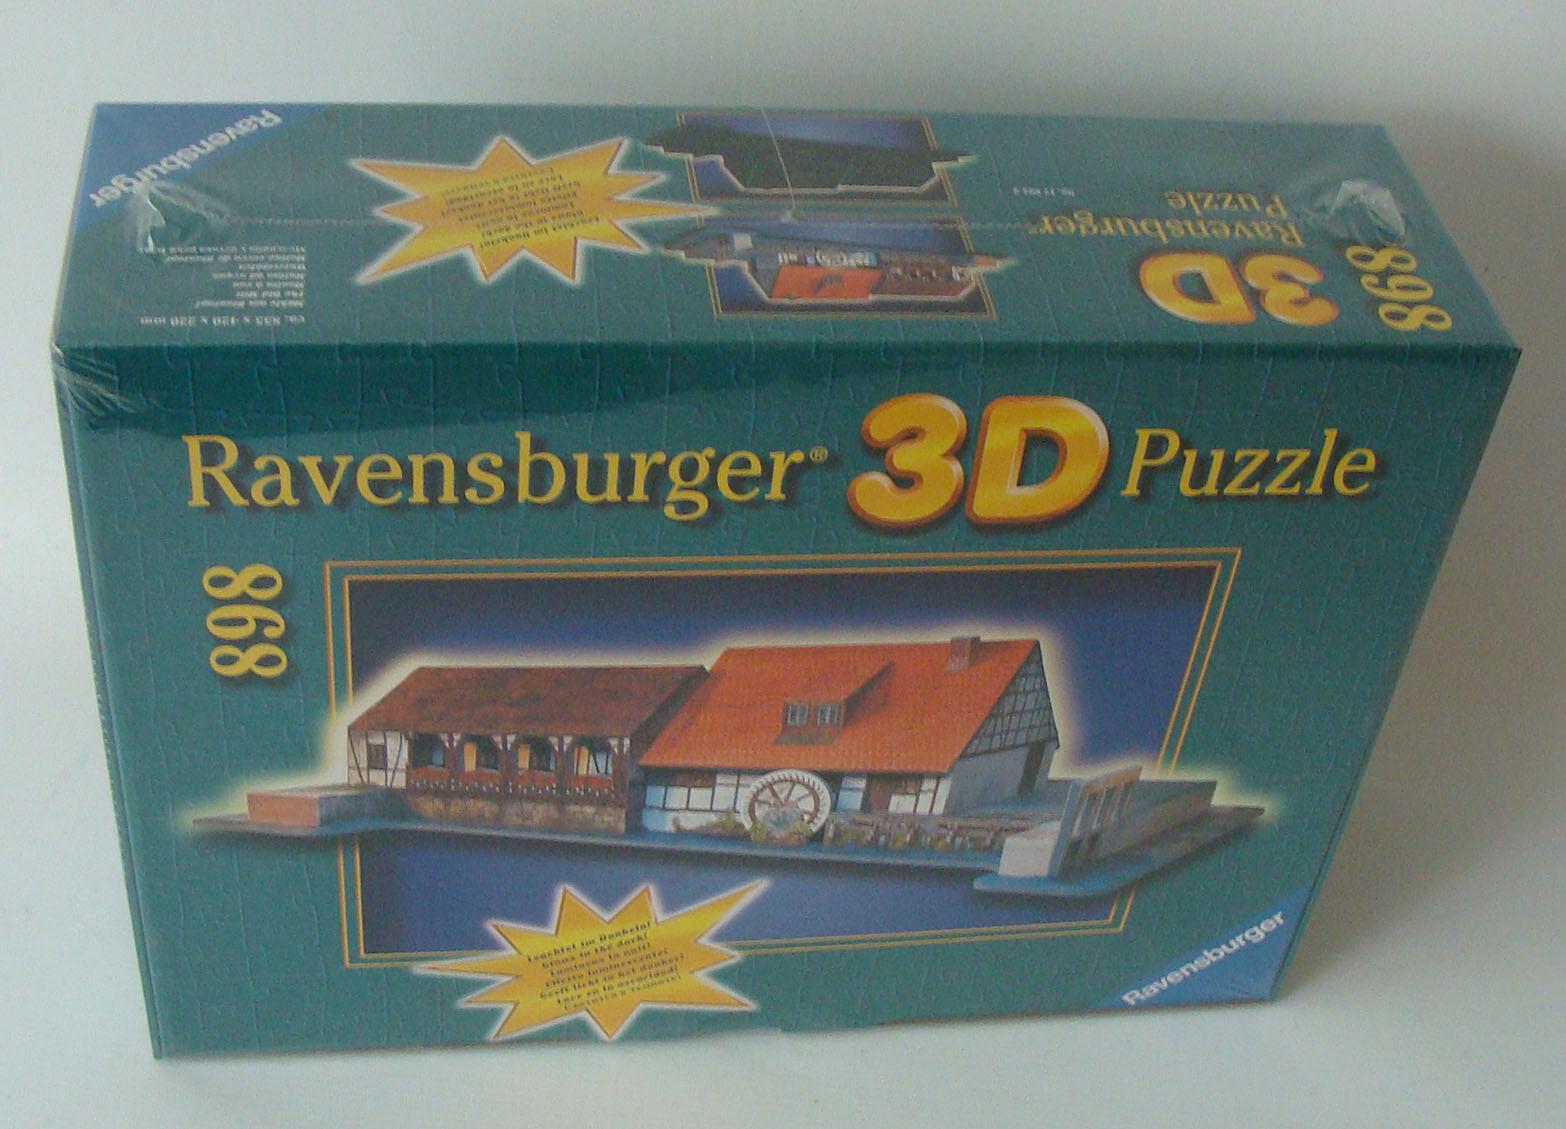 Ravensburger 3D Puzzle 178933 - Mühle am Blautopf 898 Teile 12+ - Neu    Billig ideal